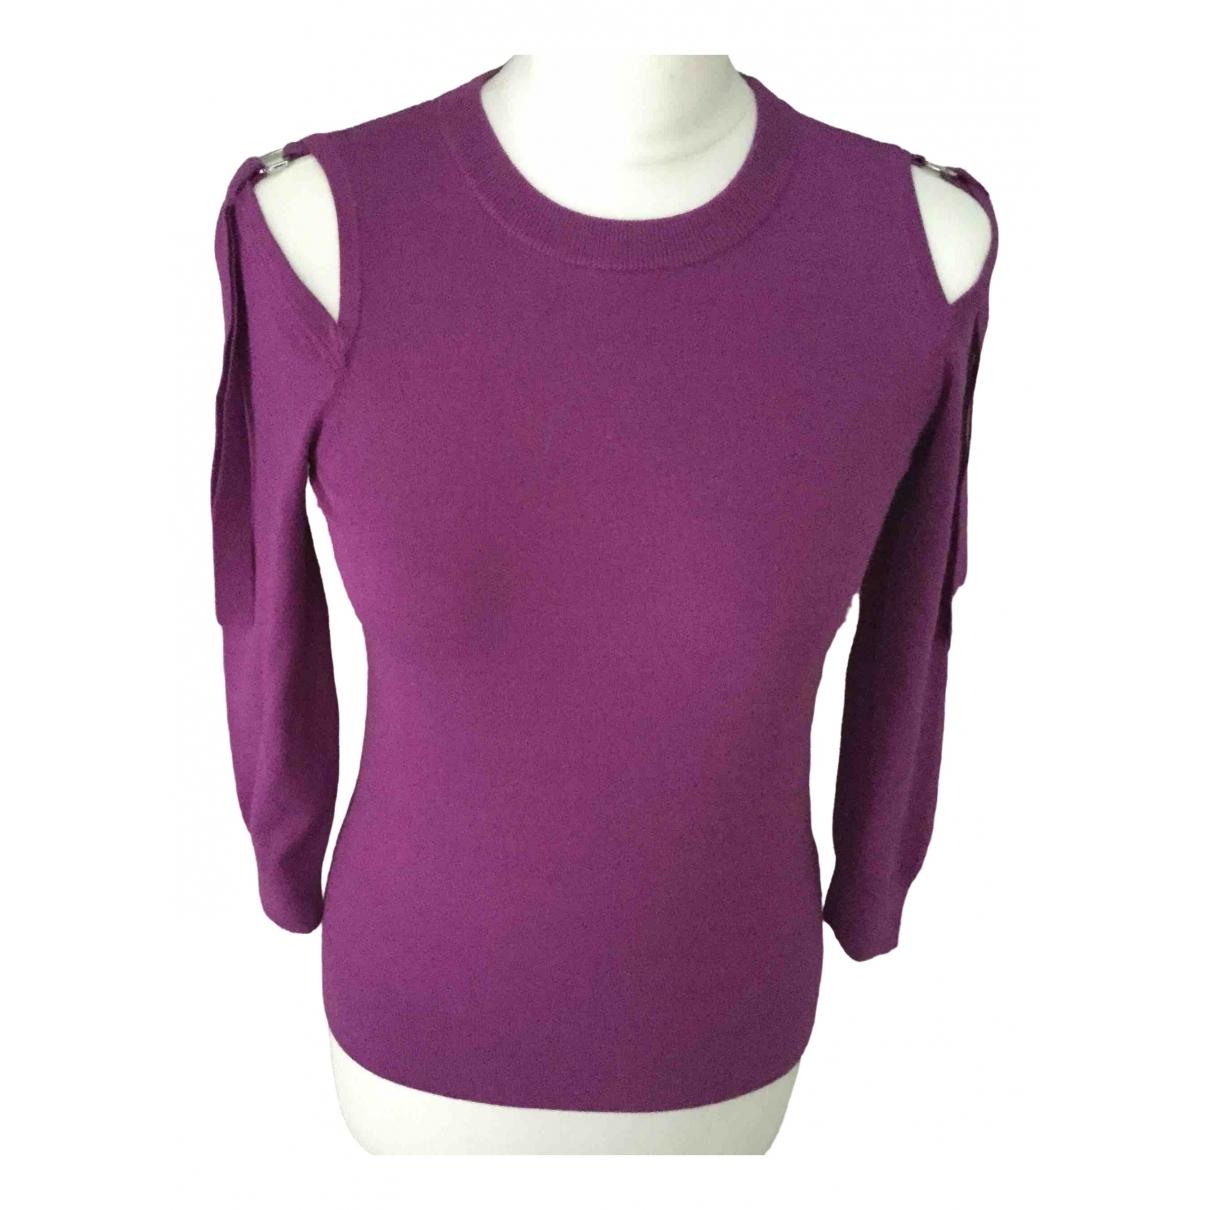 Karen Millen - Top   pour femme - violet